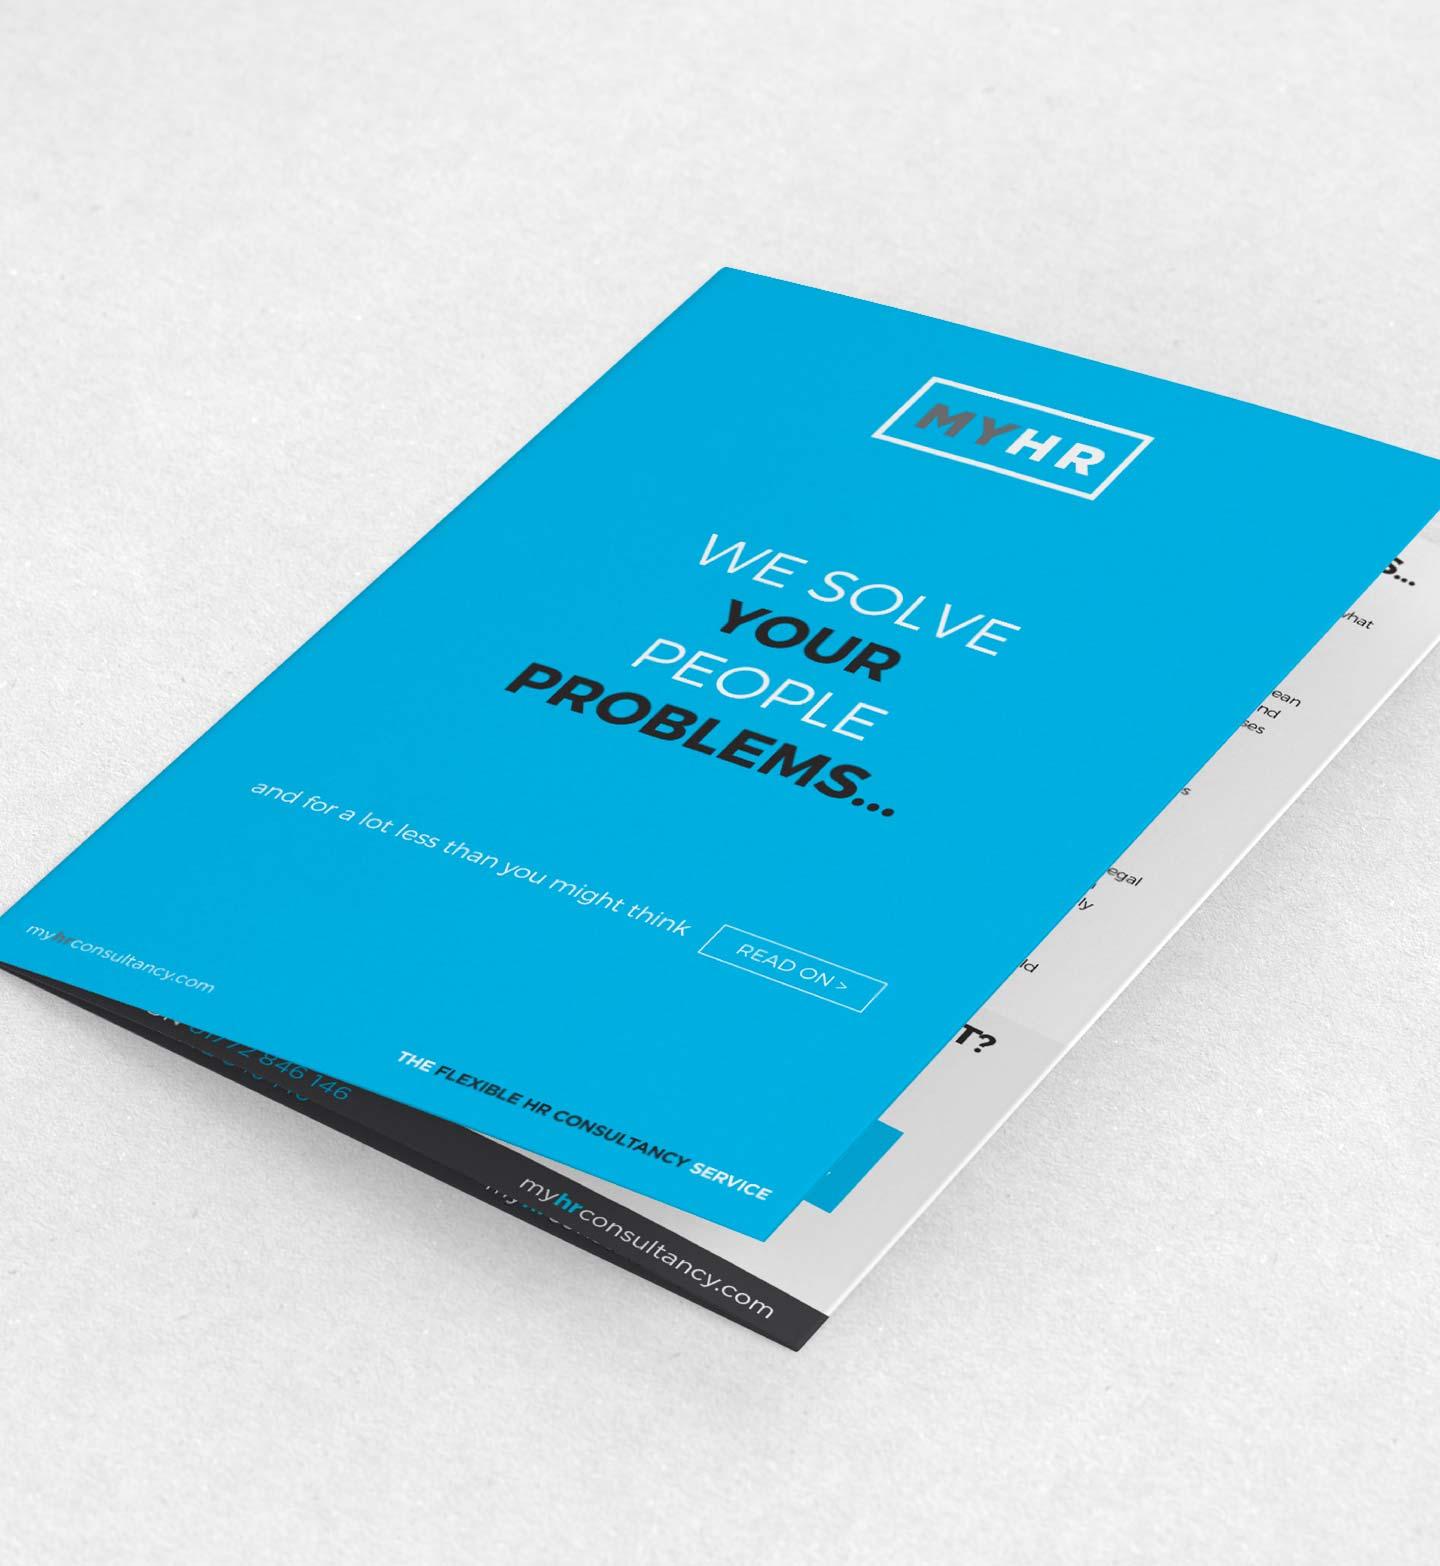 MY HR Branding, Print Materials & Website - Gossip Marketing